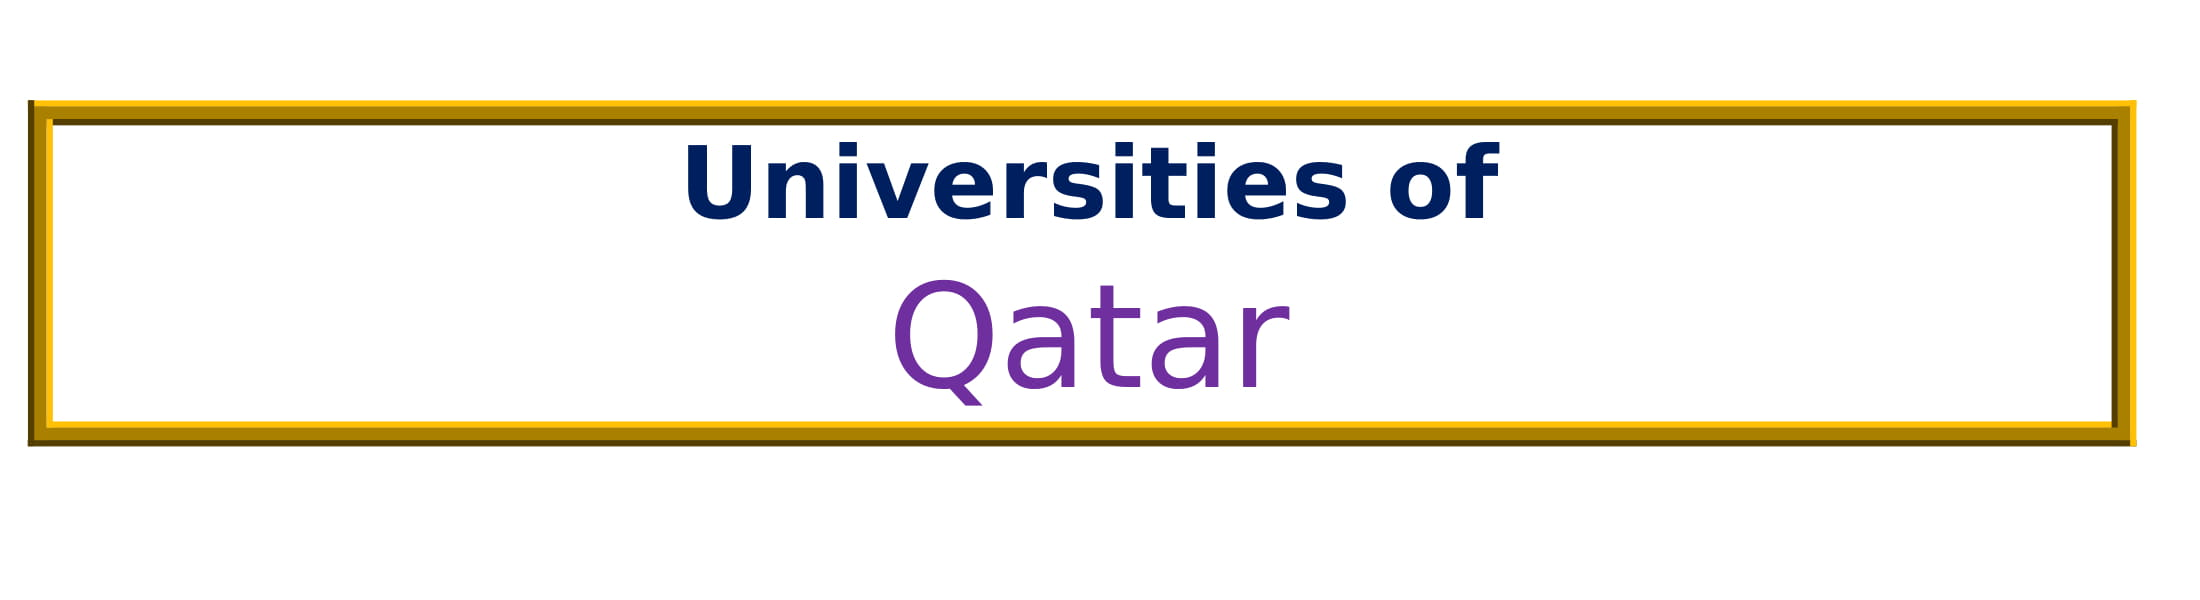 List of Universities in Qatar